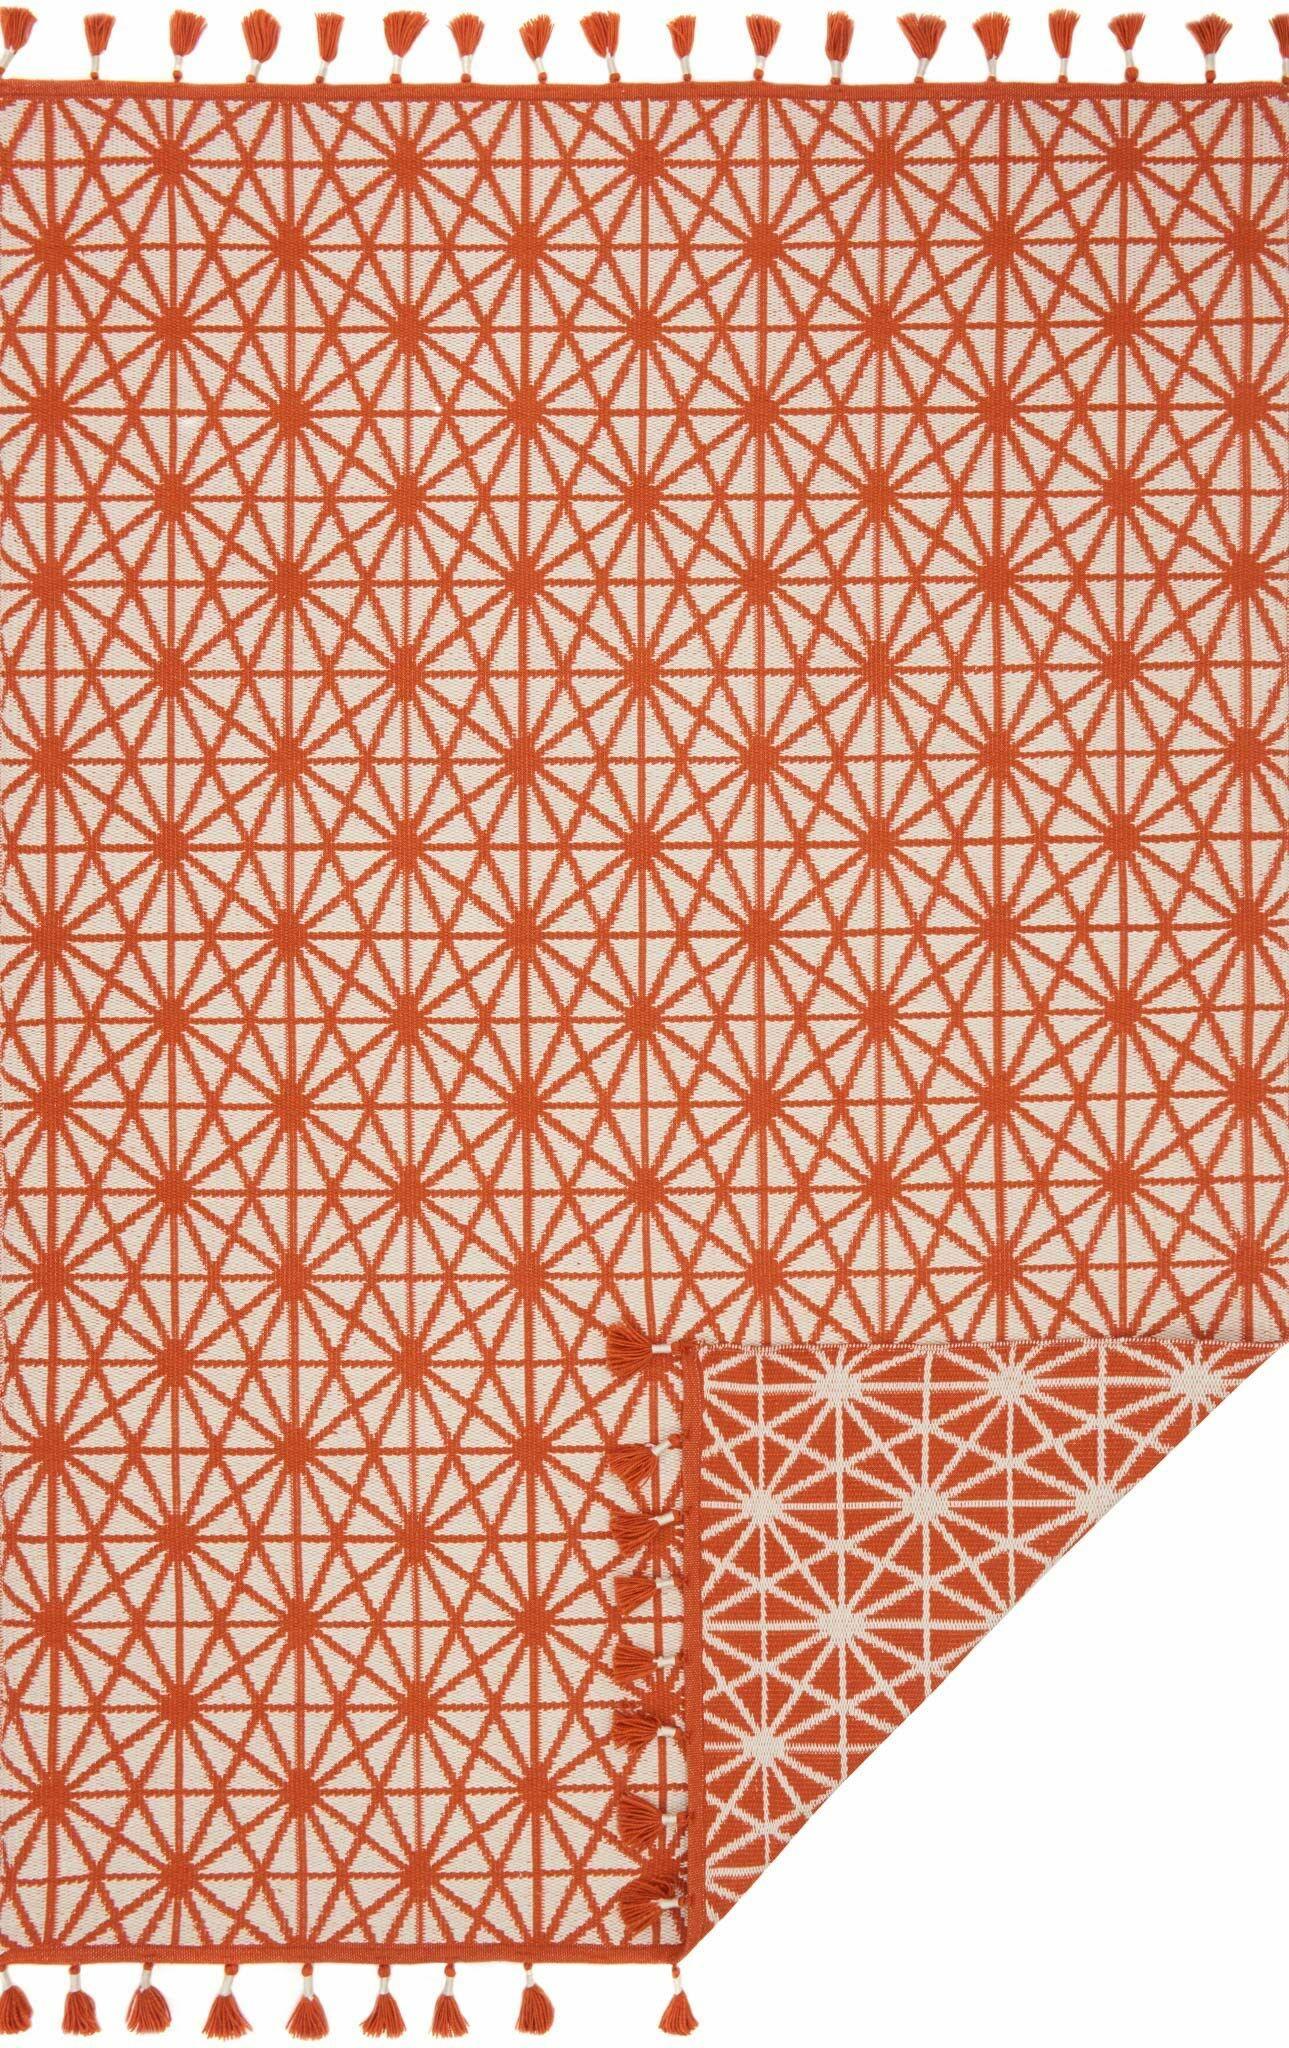 Pangburn Hand-Woven Orange Area Rug Rug Size: Rectangle 7'9